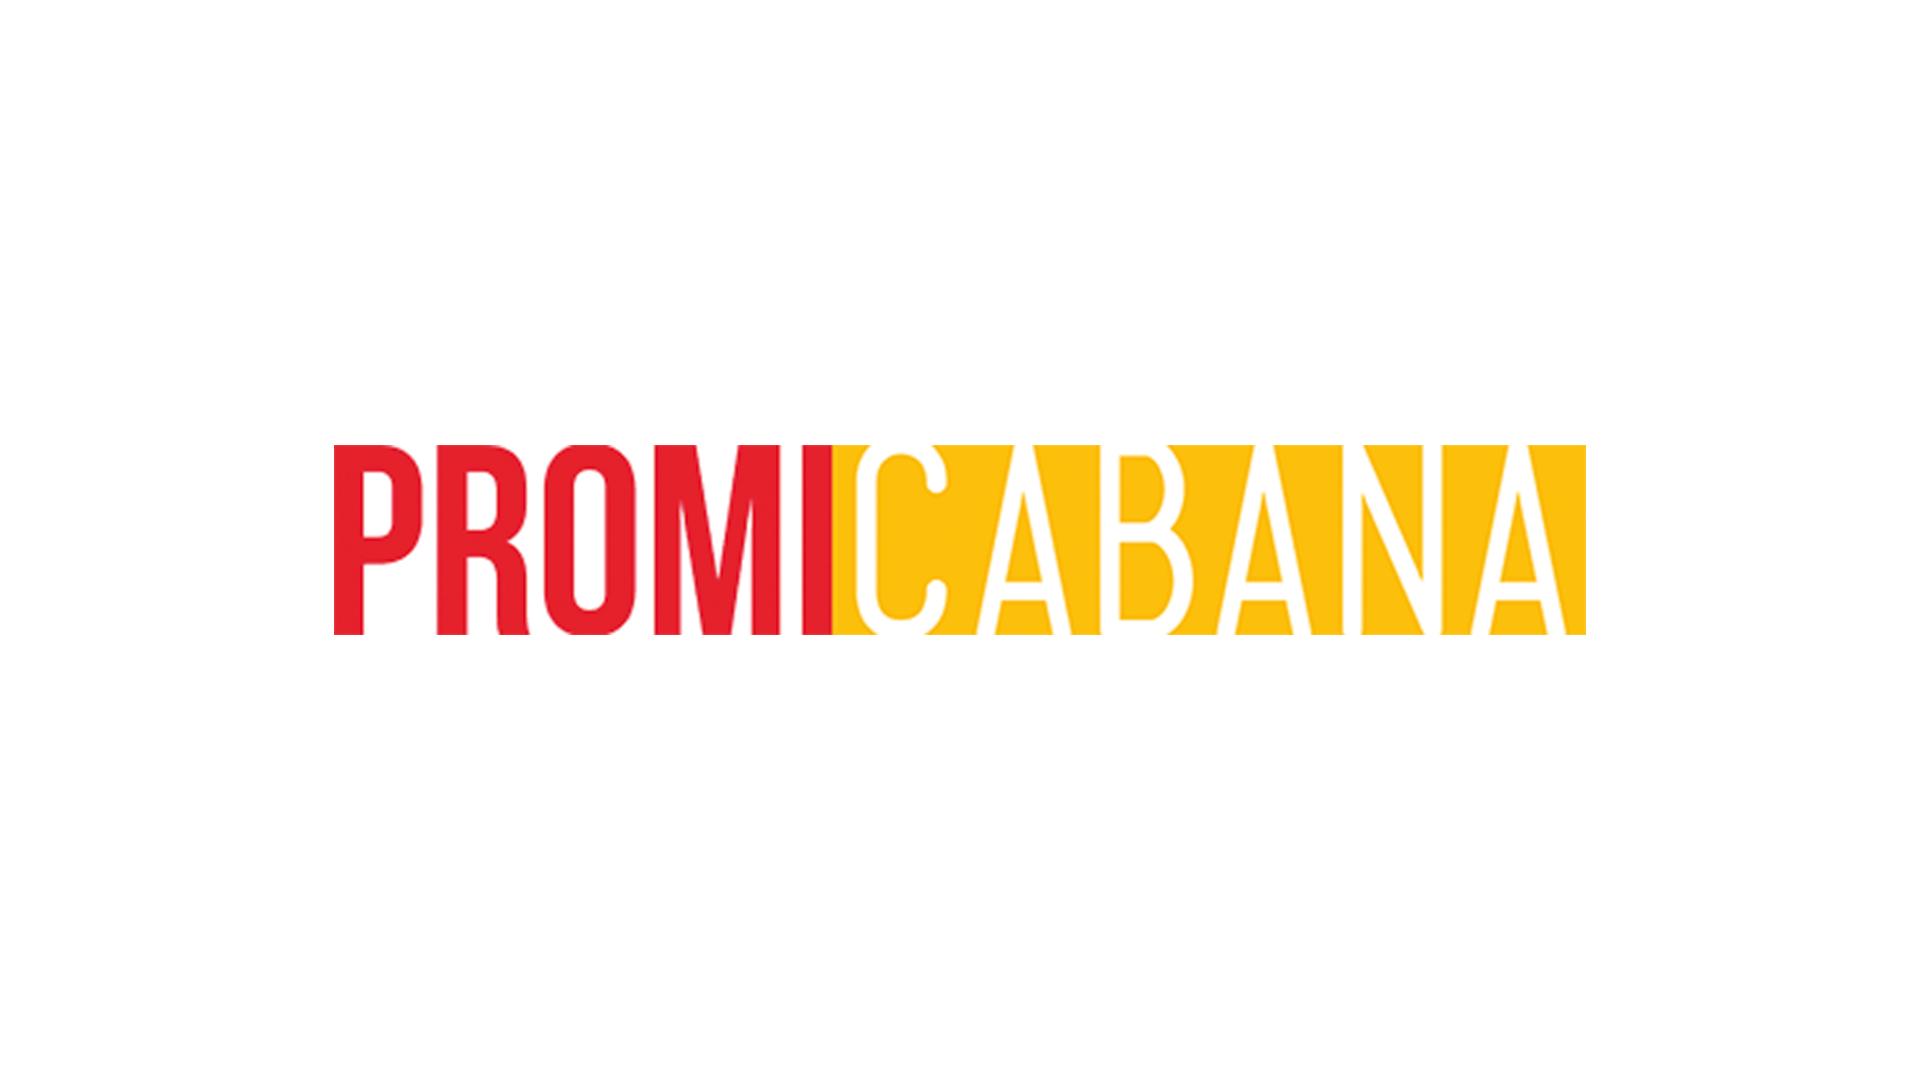 George-Michael-Wham-Last-Christmas